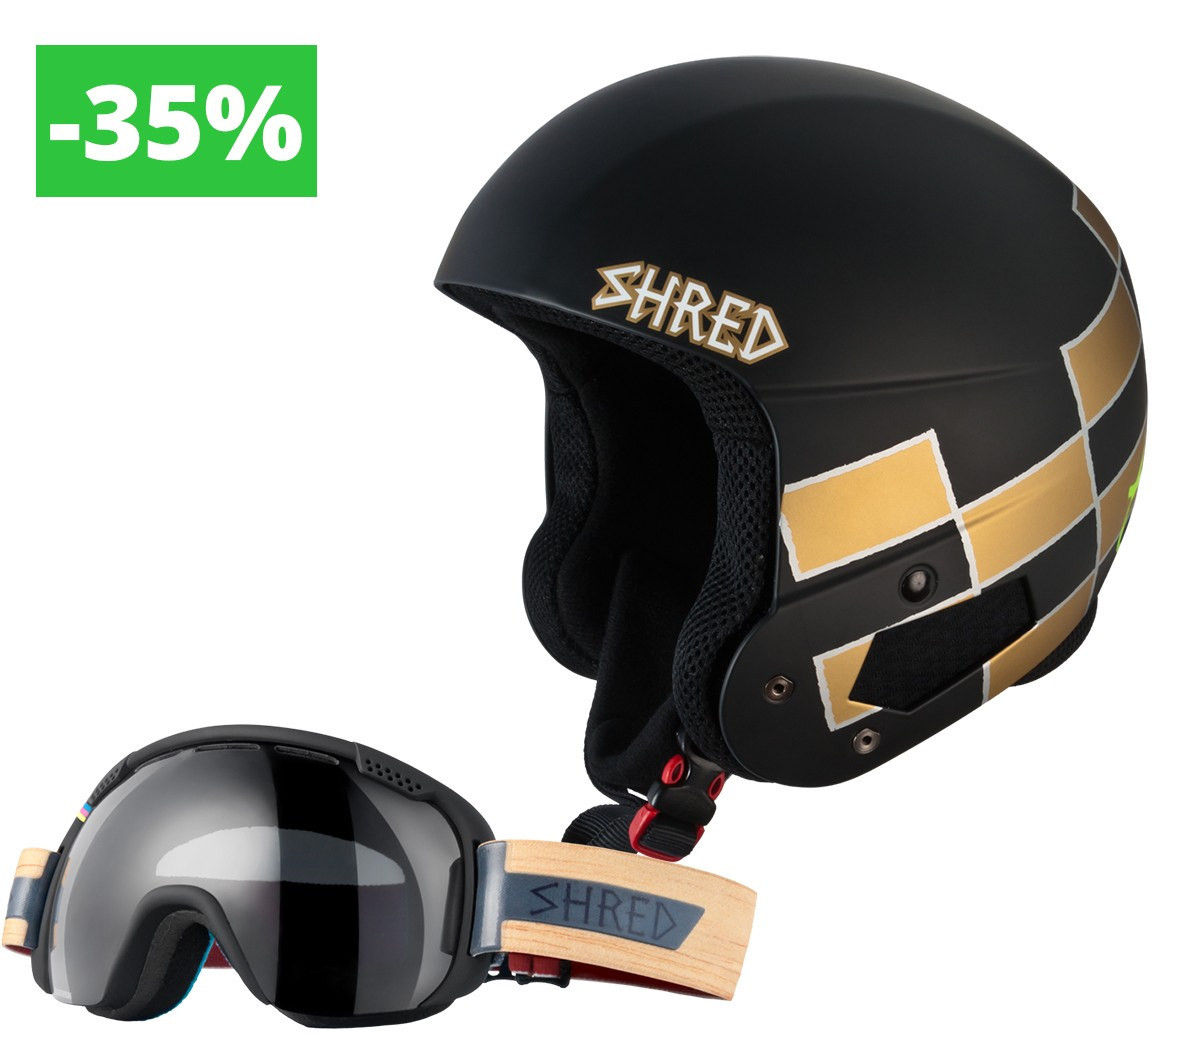 Shred komplet Brain Bucket Raptor (Lara Gut) + Smartefy Shrastawood